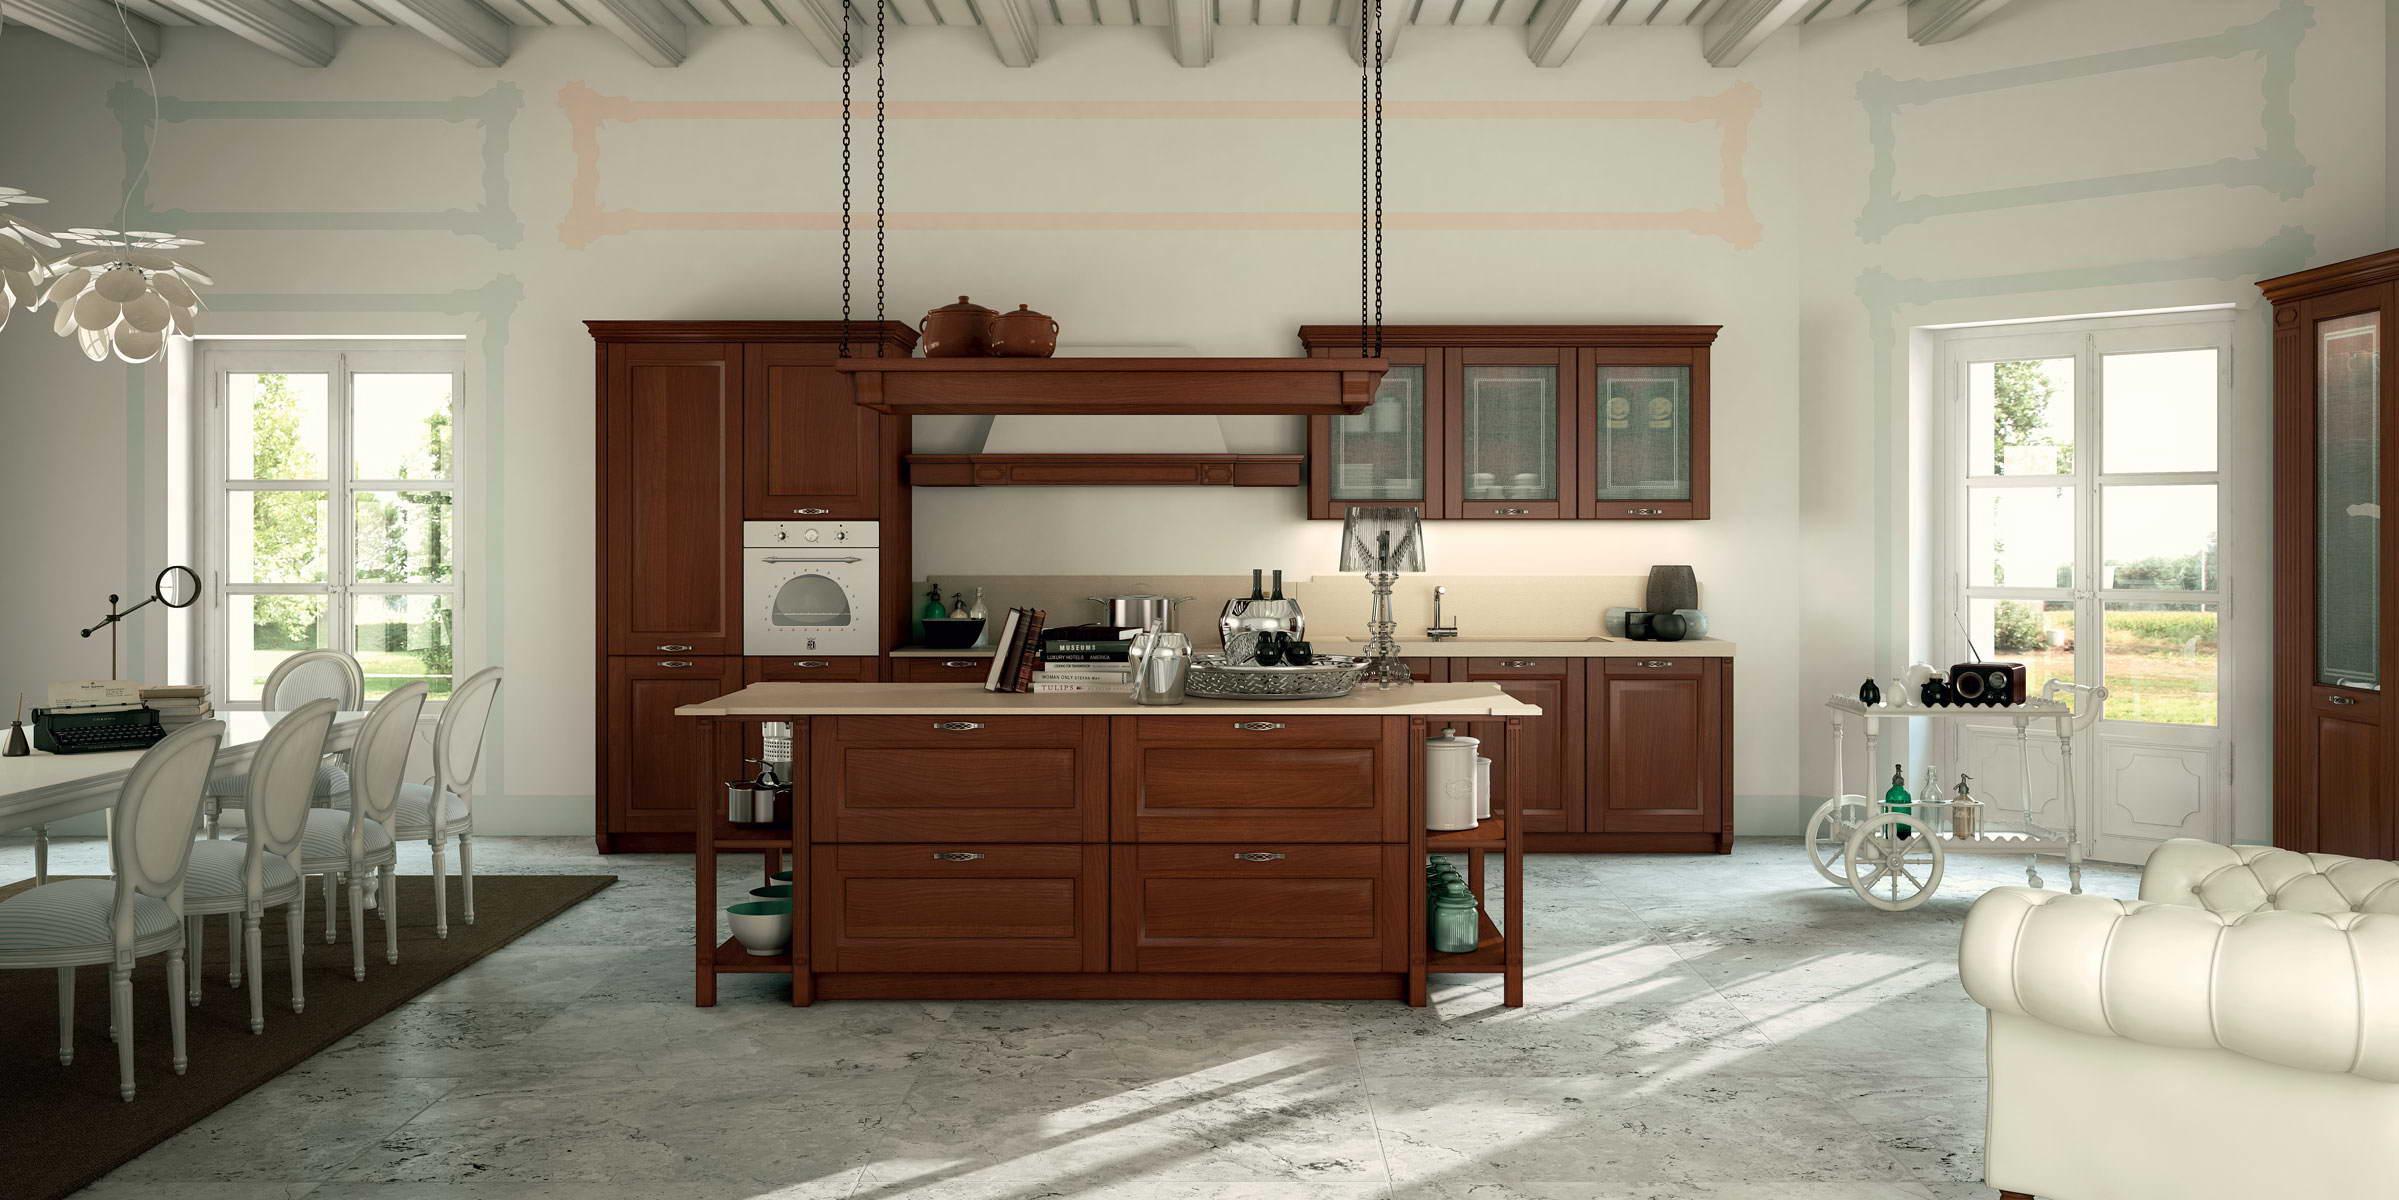 Del tongo amelia mobili gala - Cucine del tongo opinioni ...